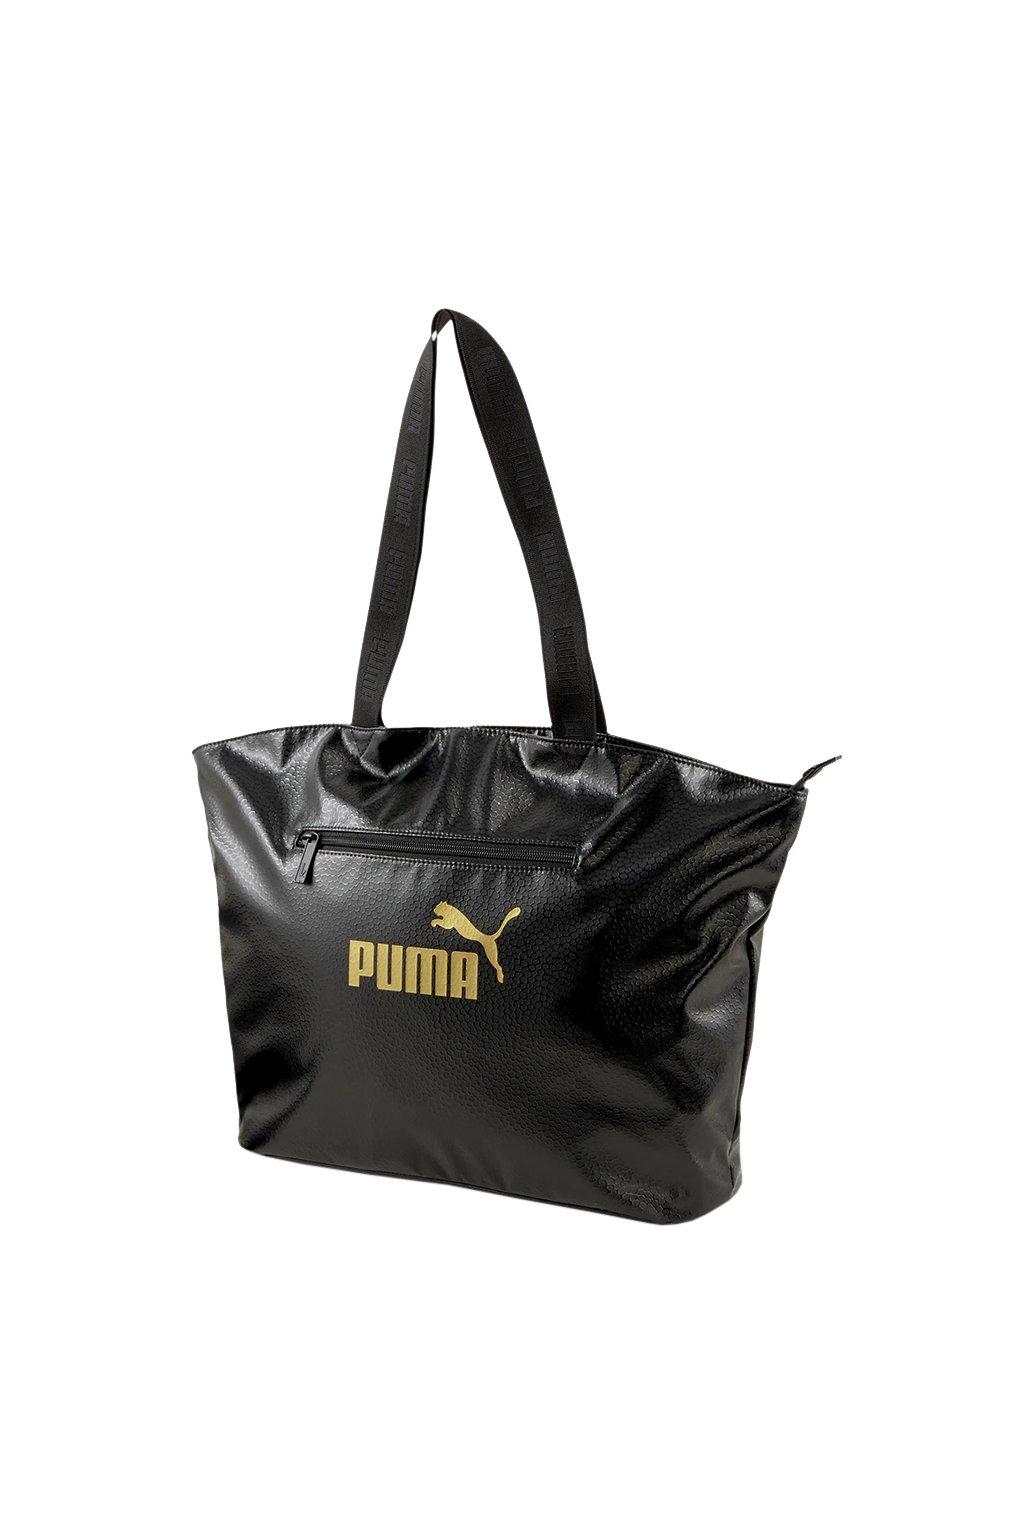 Dámska taška Puma Core Up Large Shopper OS čierna 78309 01